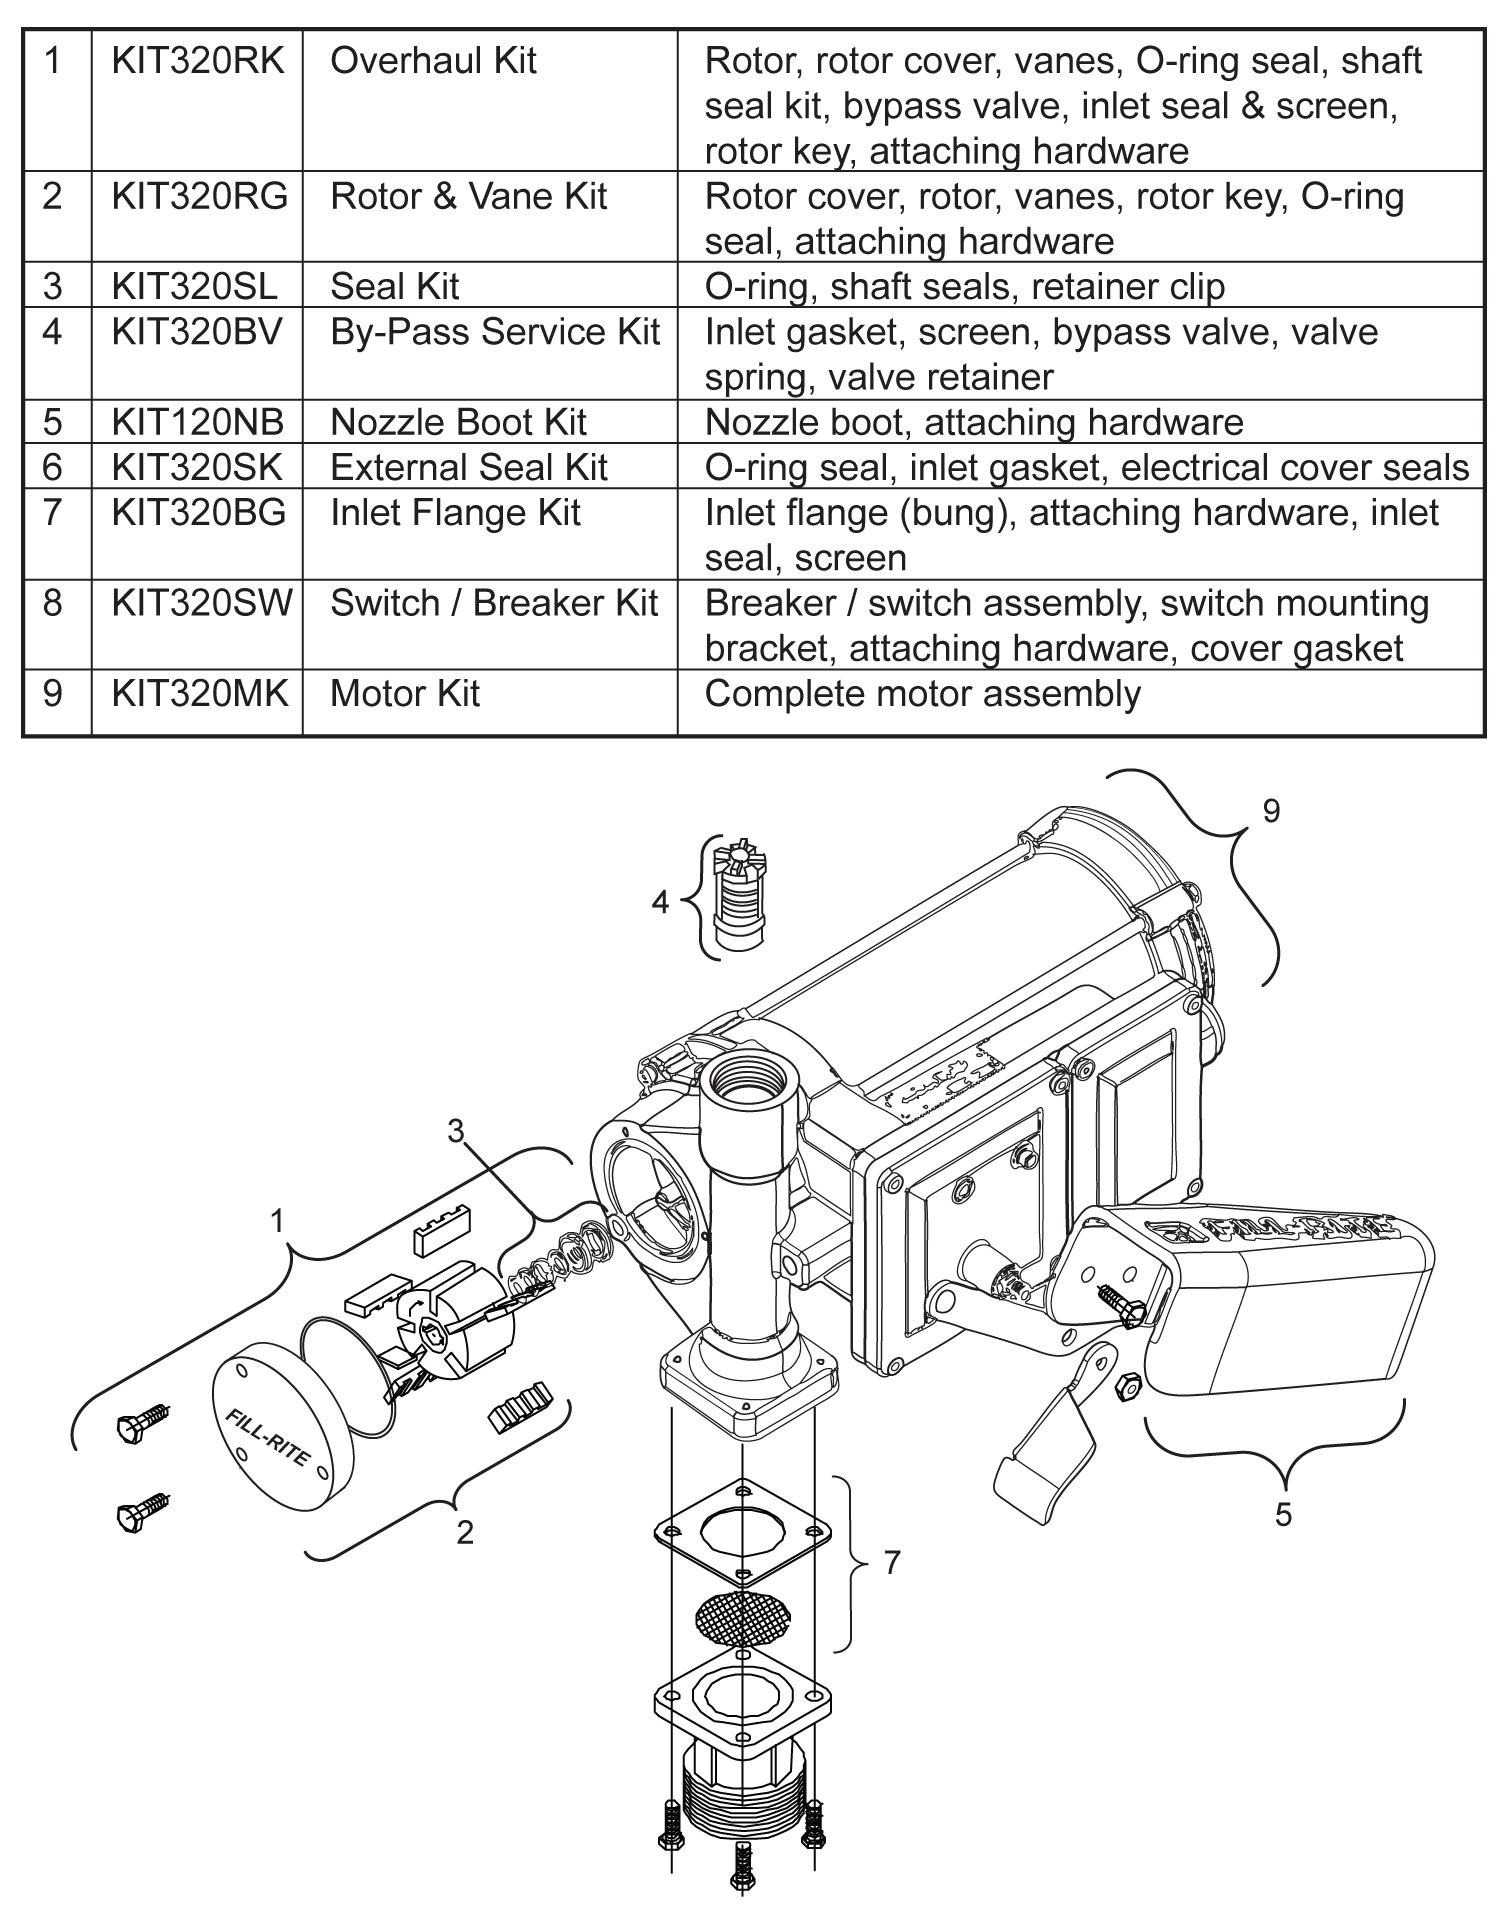 fill rite pump wiring diagram wire center fill rite pump wiring submersible well pump wiring diagram fill rite pump switch diagram example electrical wiring diagram fill rite pump wiring diagram